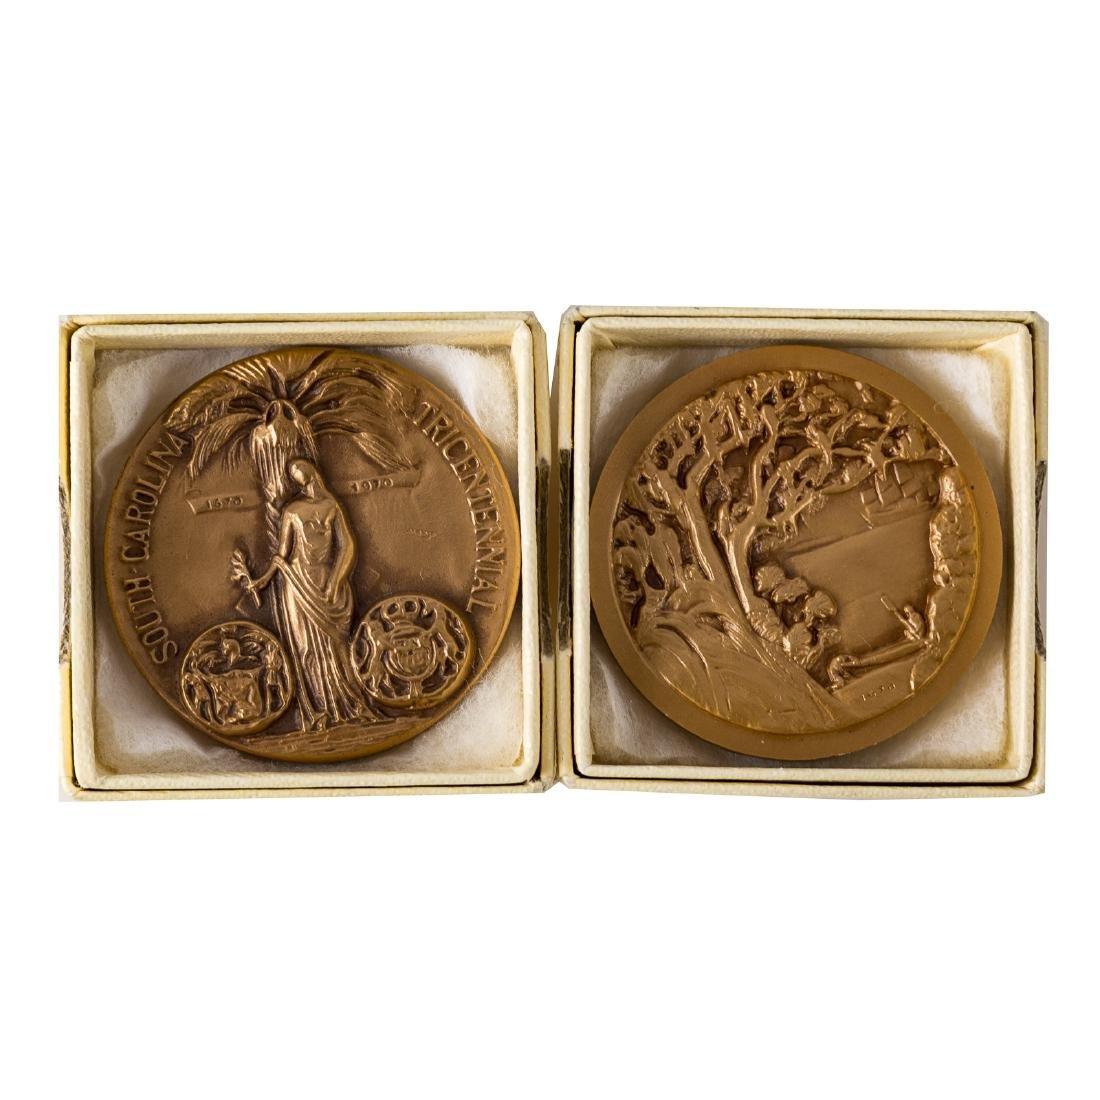 Collection of US Bicentennial era medals - 4